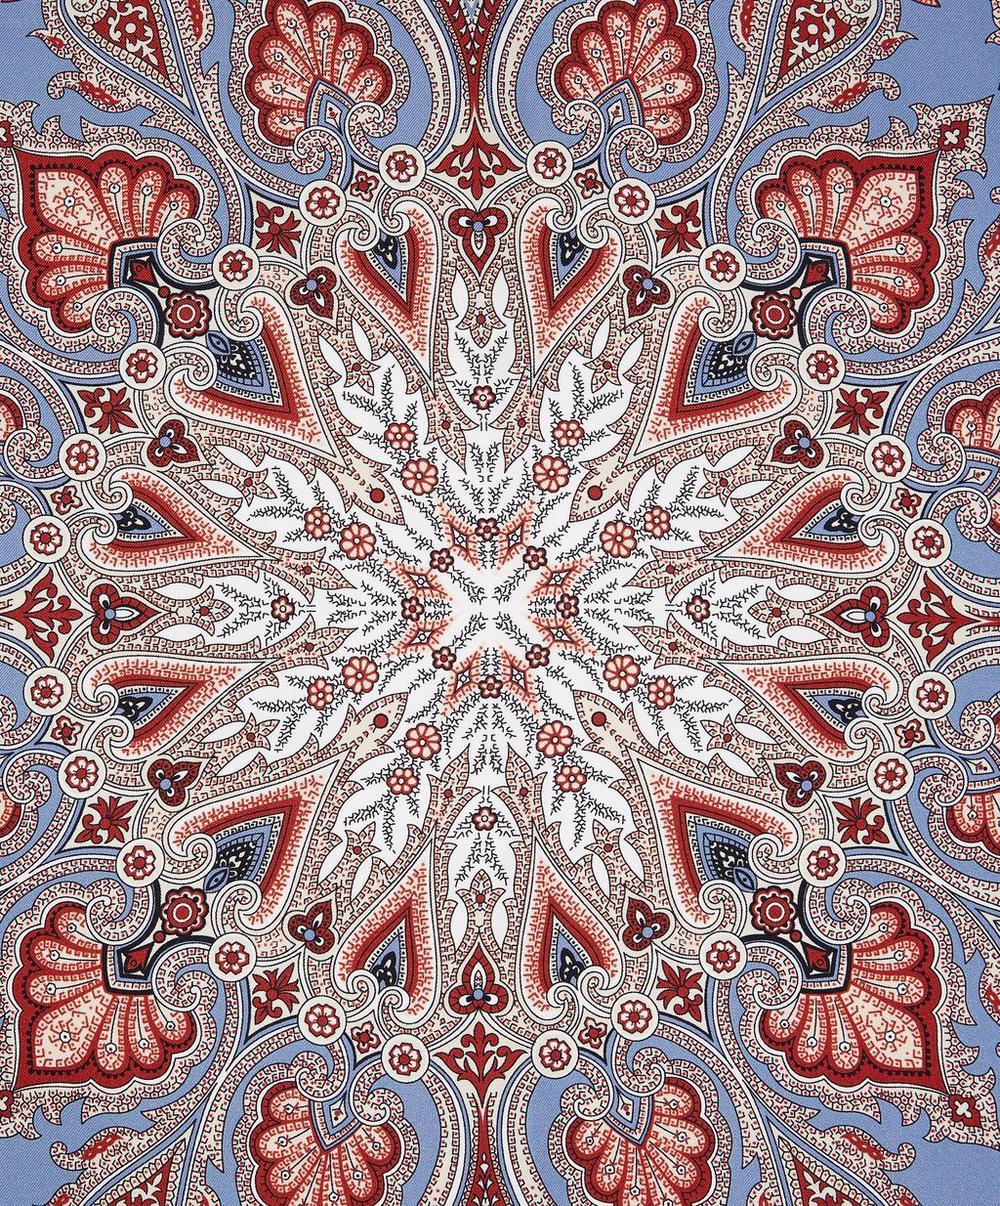 Overton Paisley 70 x 70cm Silk Scarf